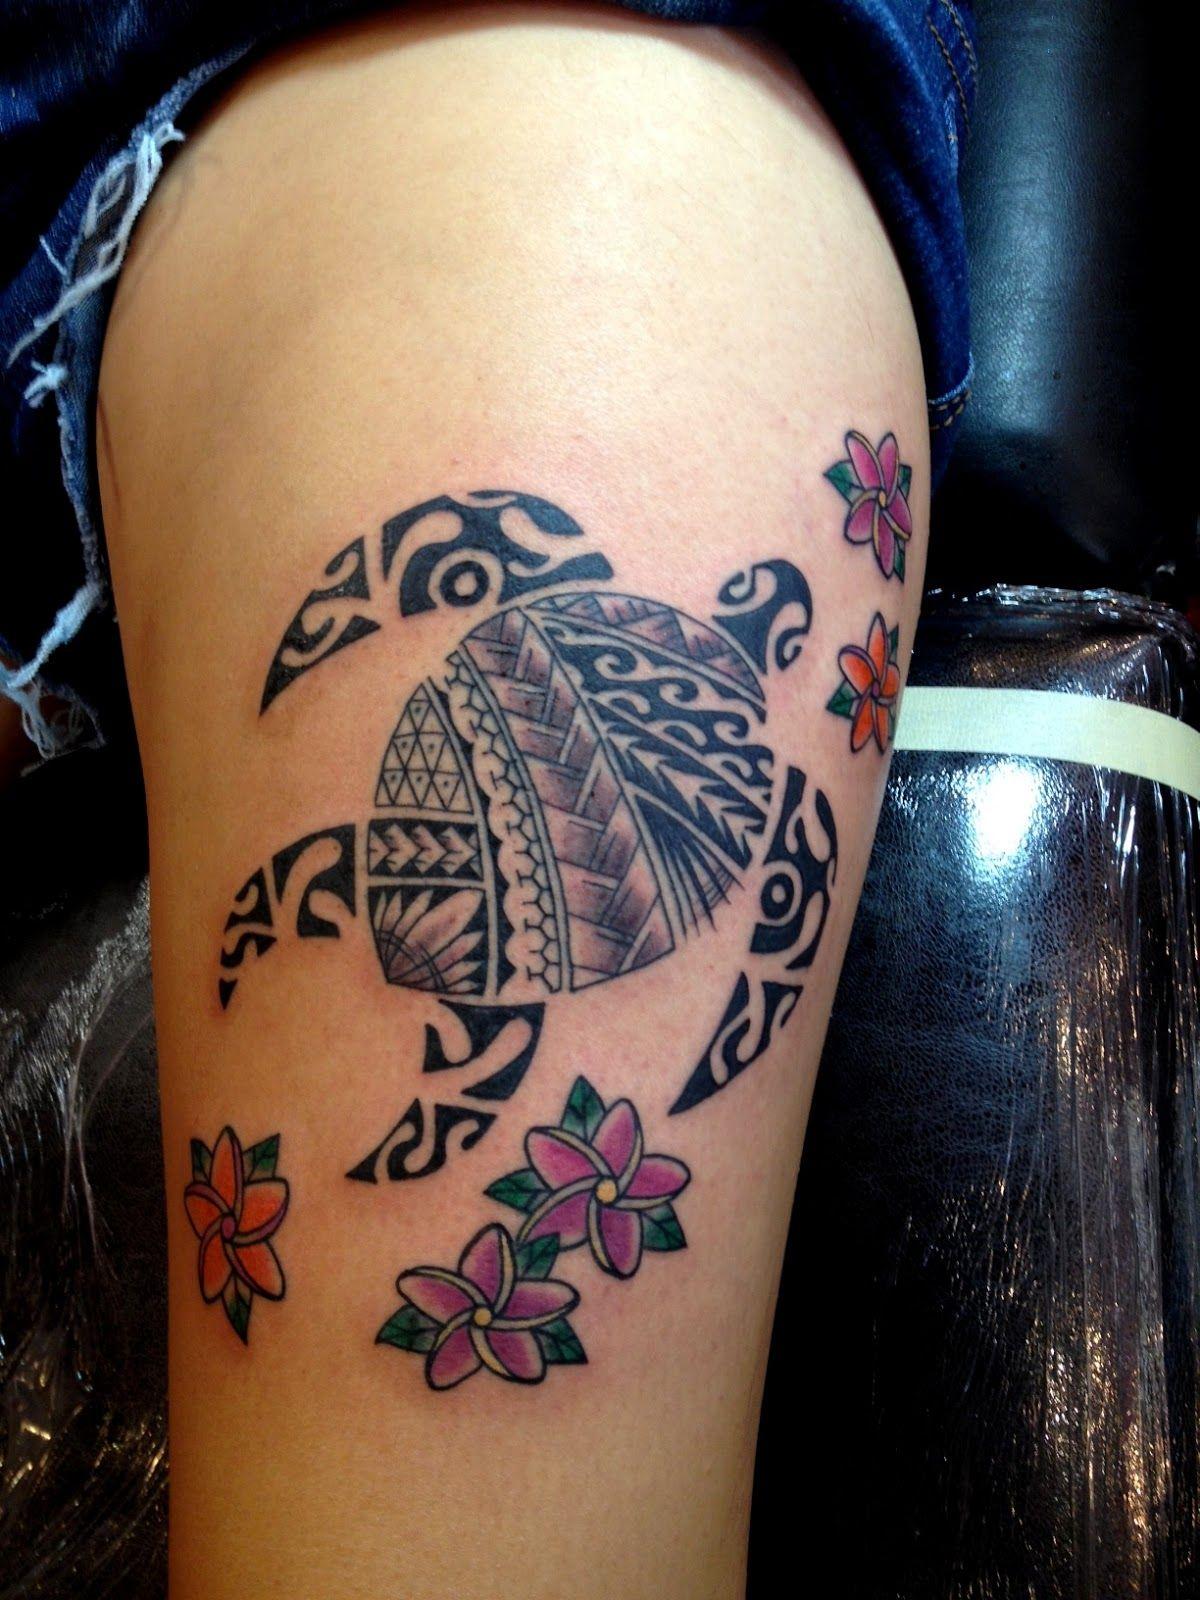 Costas Maori Check The Blog Tattoo Tatuagens Tribais